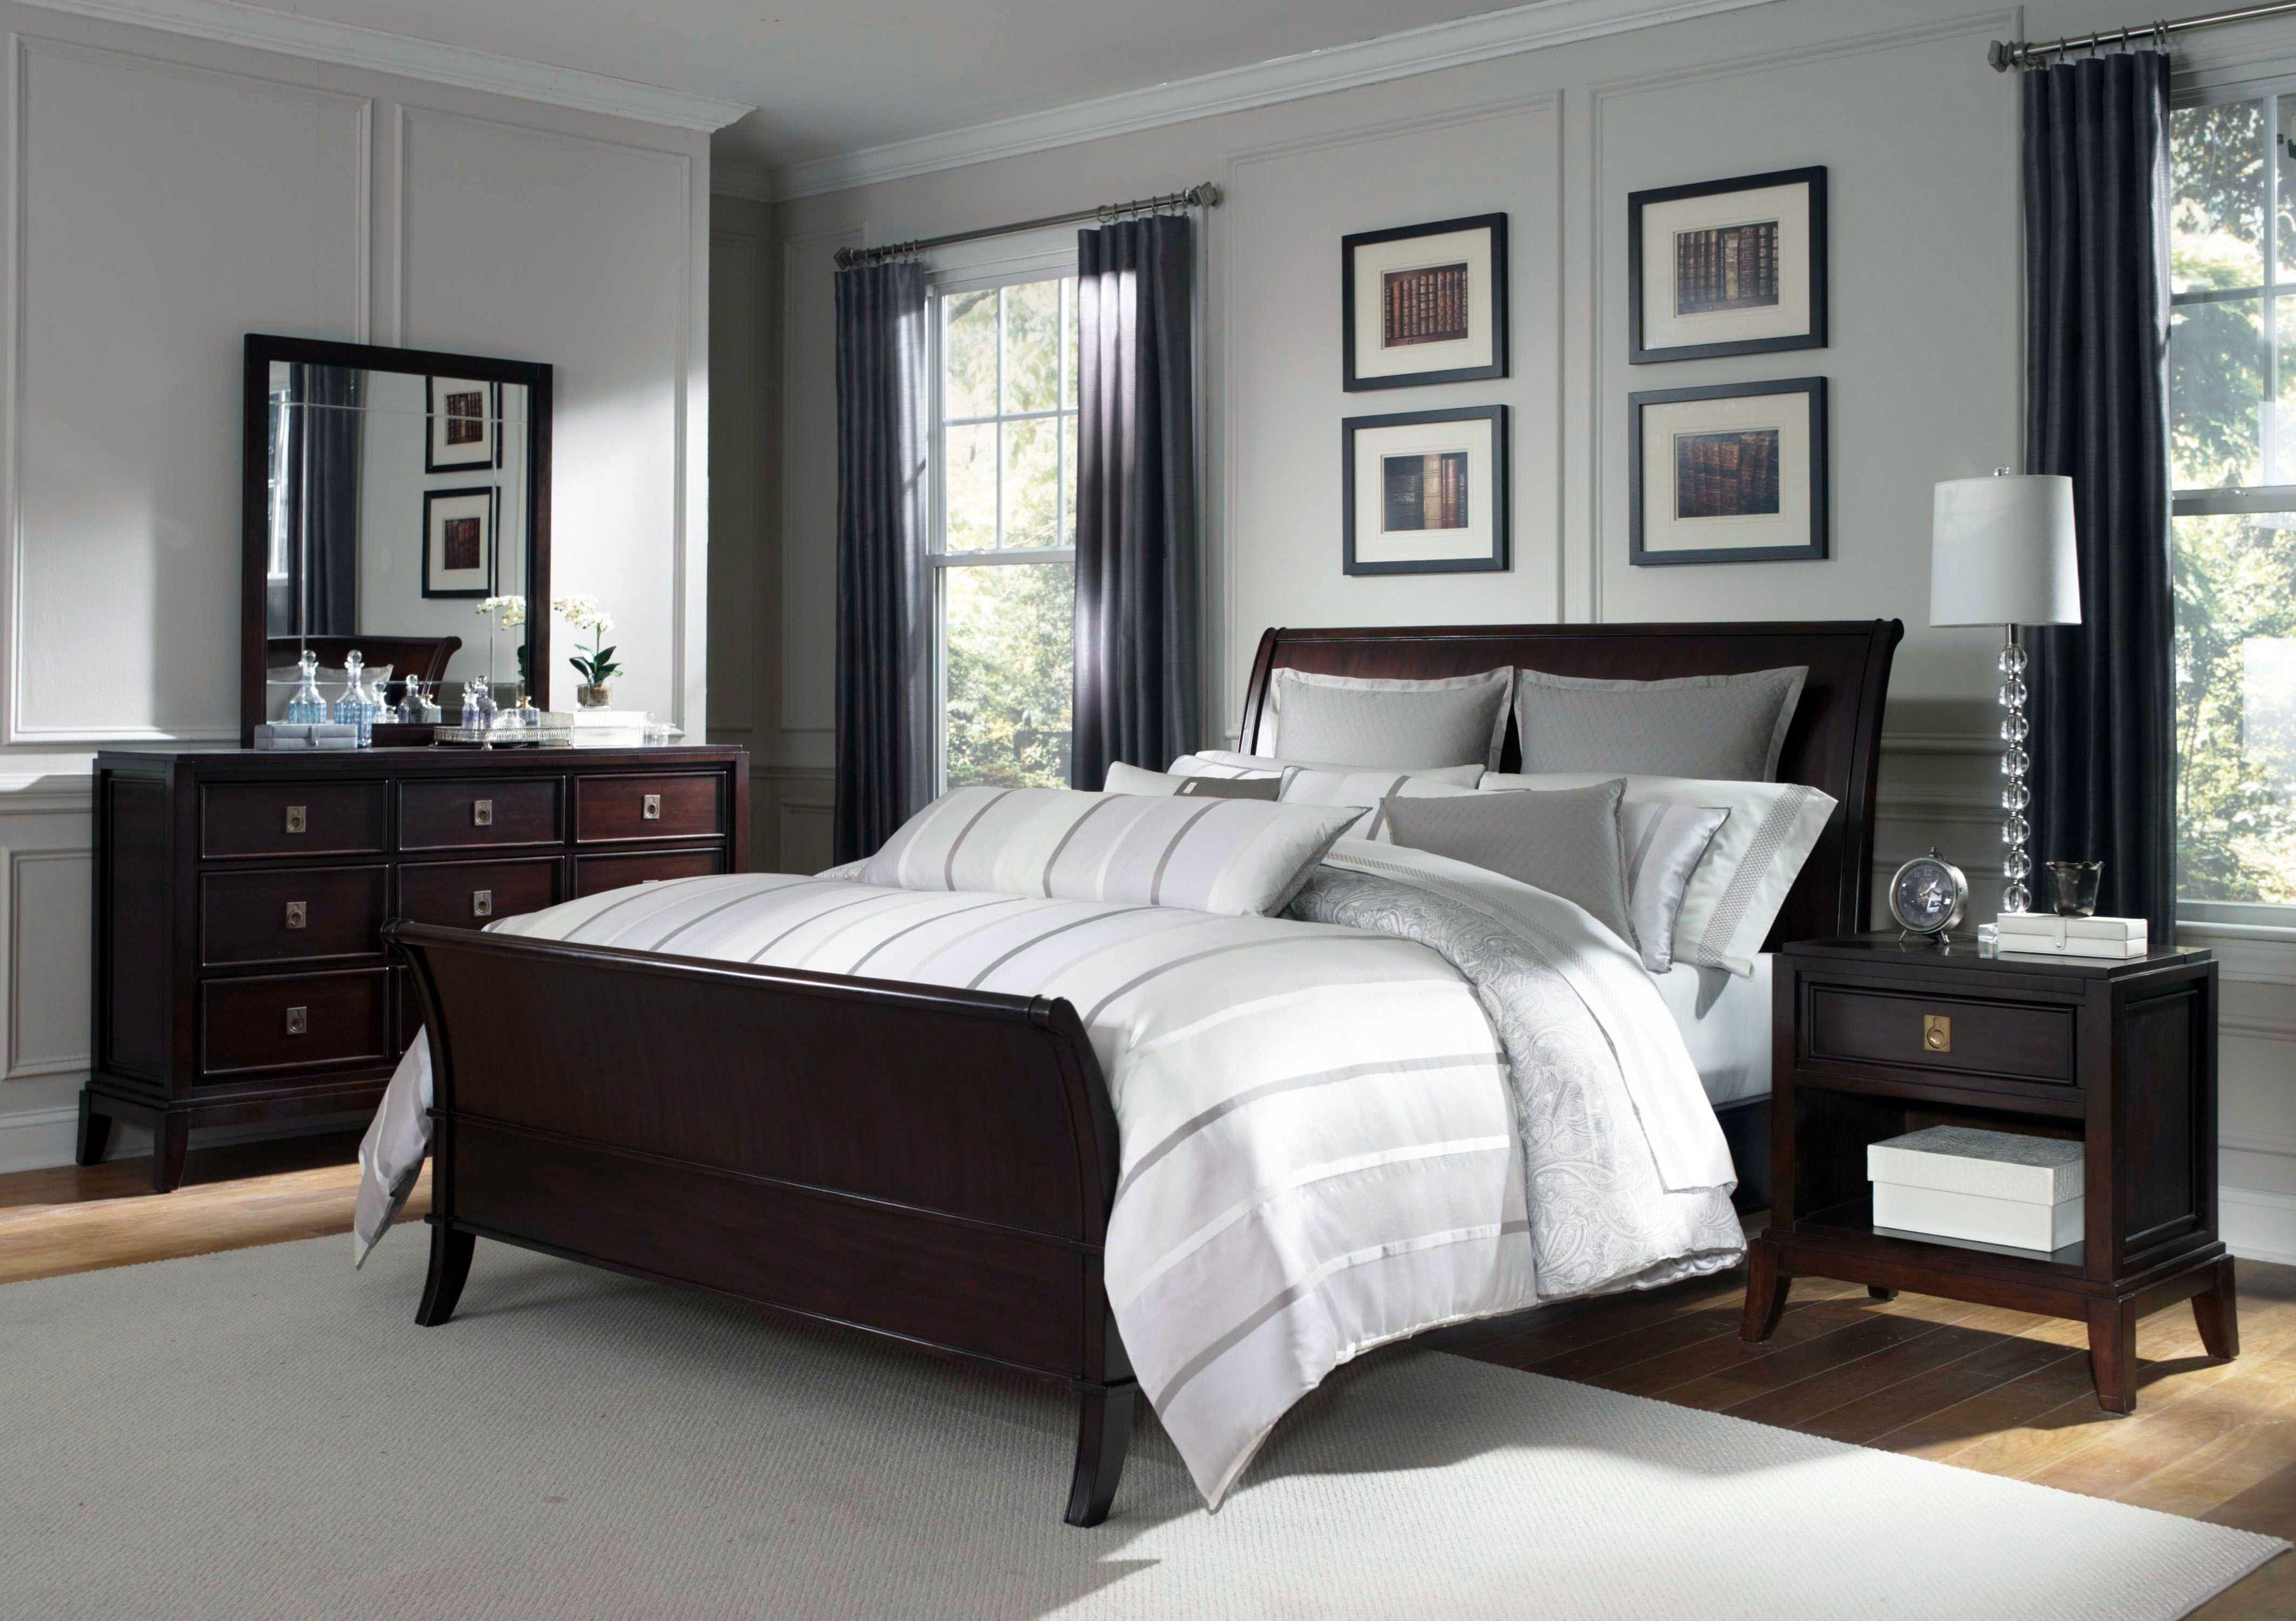 Master Bedroom Decorating Ideas  Brown furniture bedroom, Wood